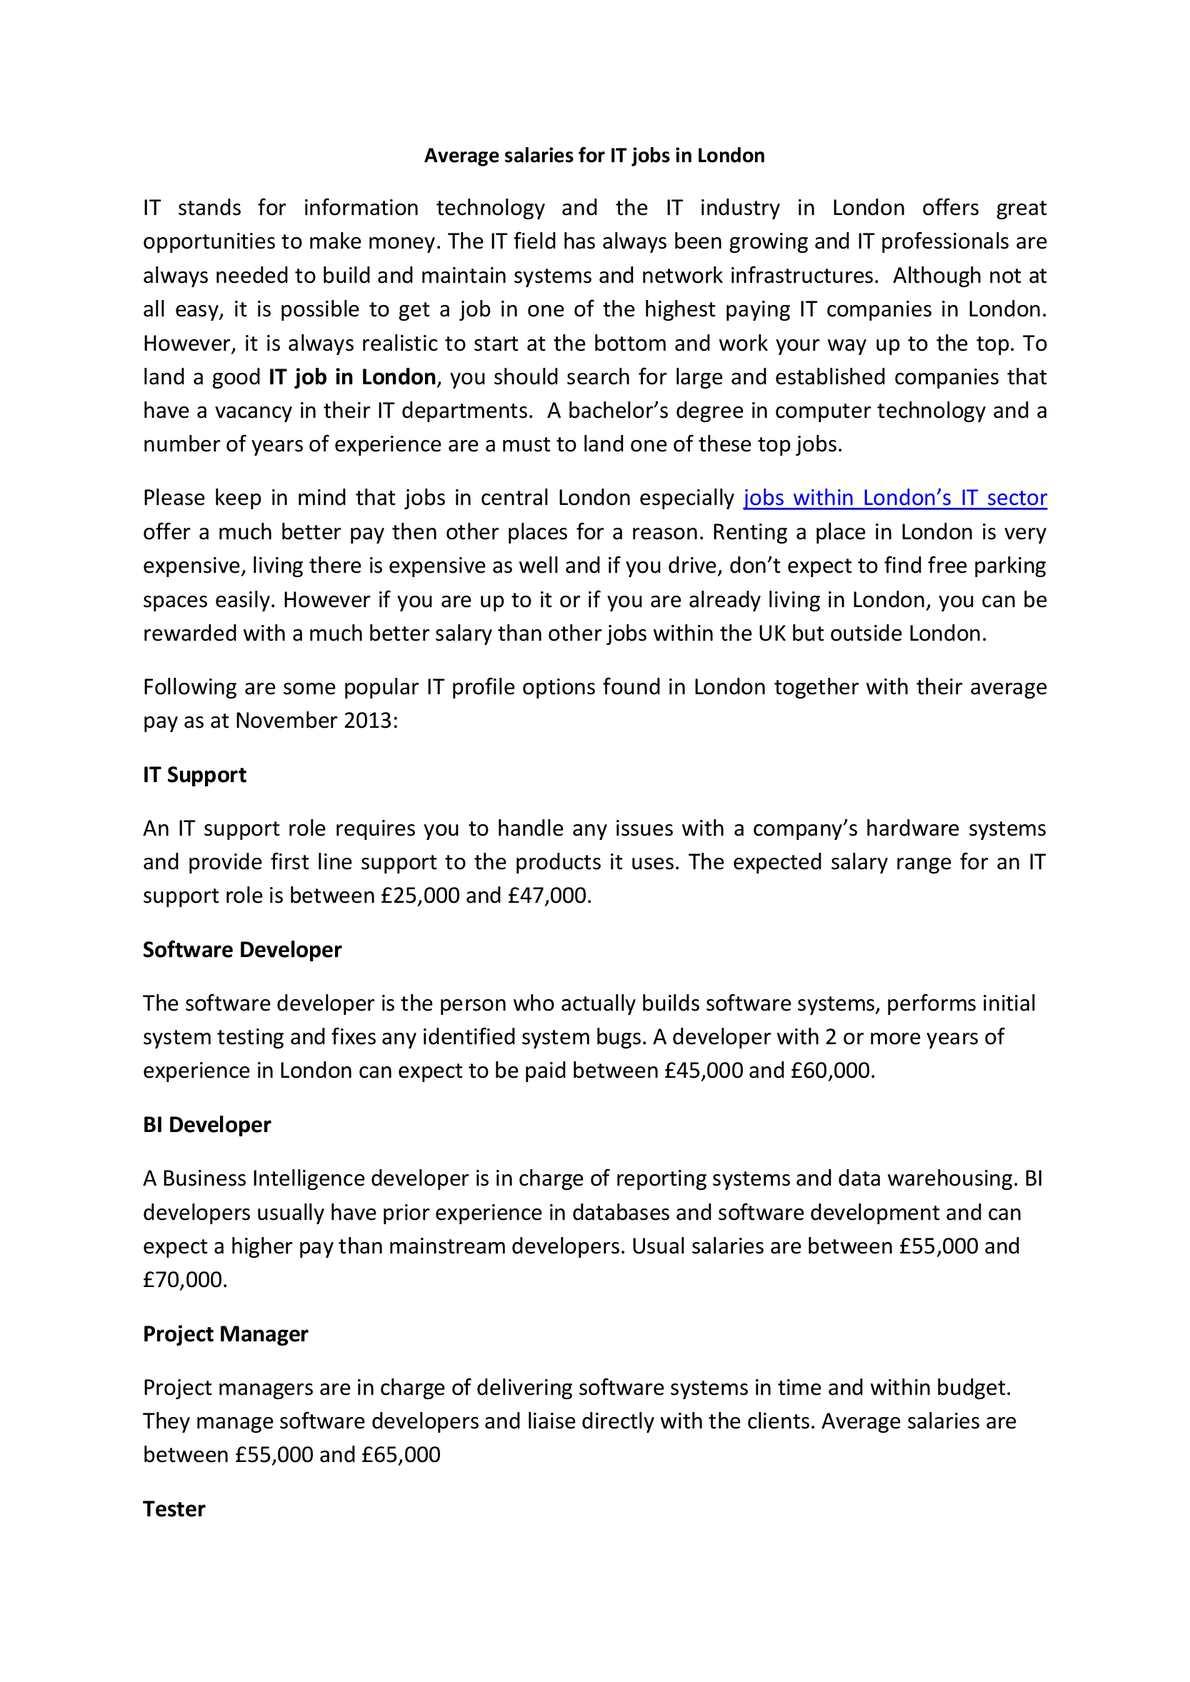 bi developer salary - Parfu kaptanband co